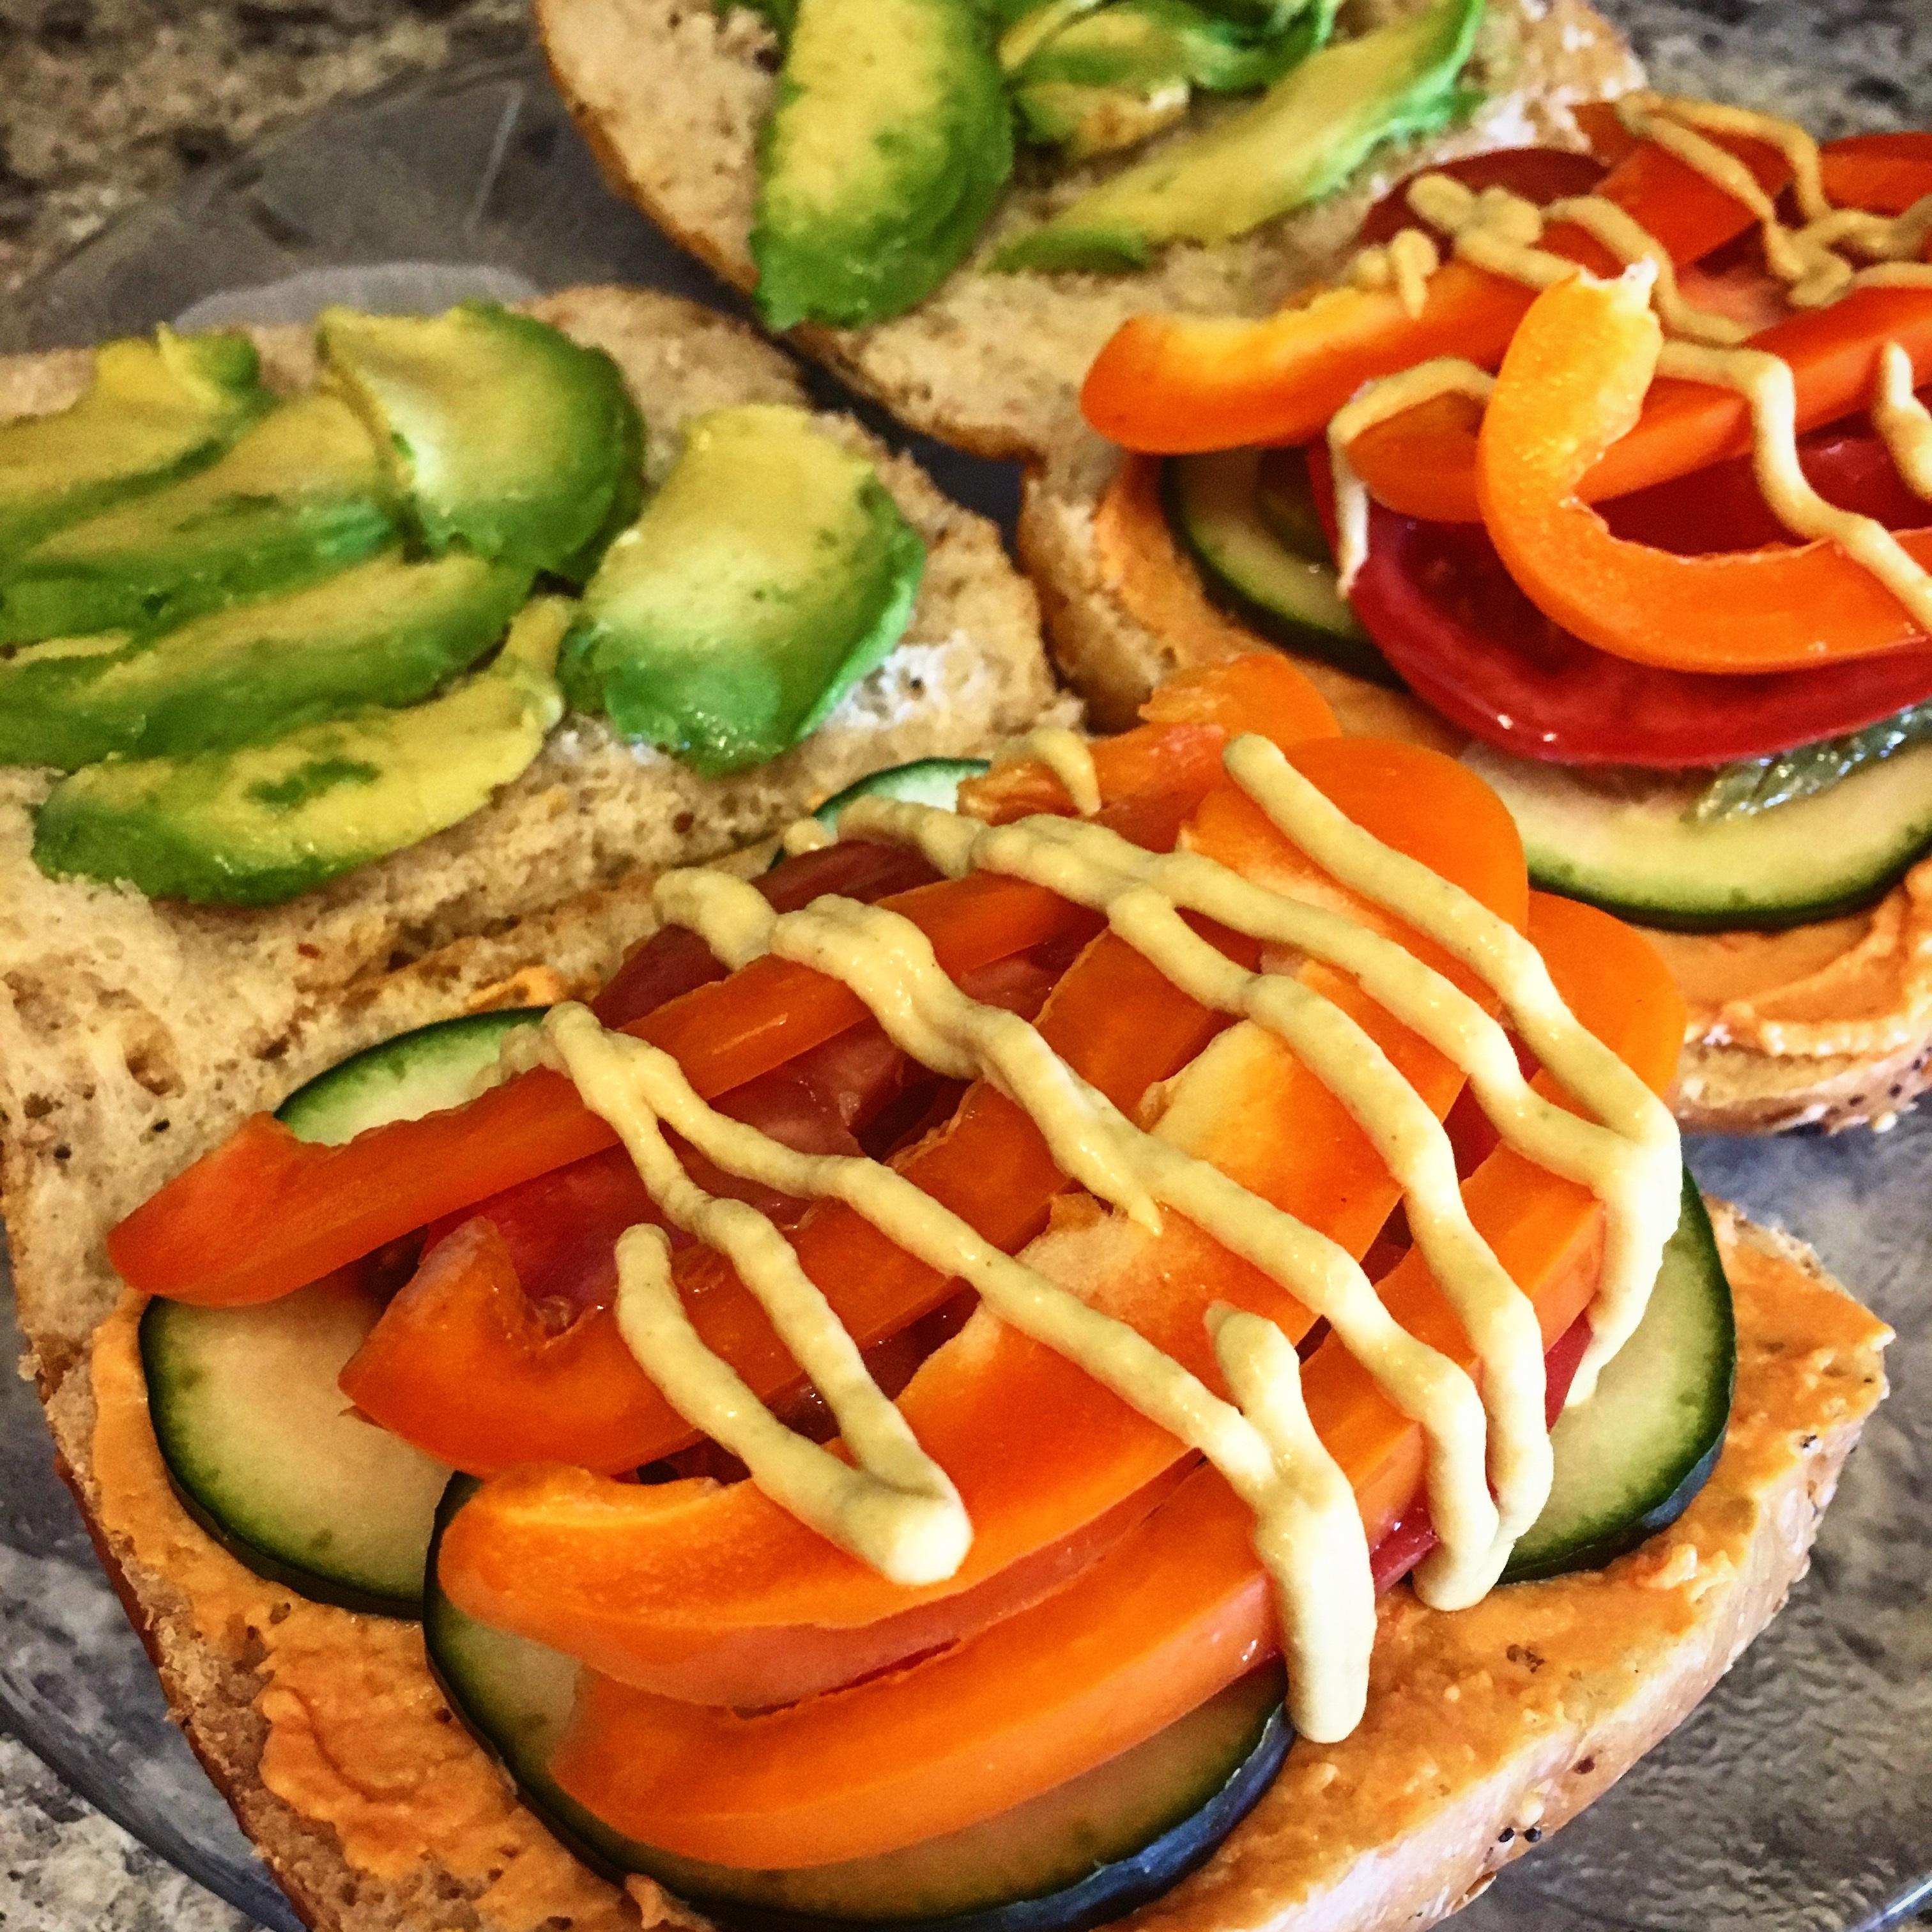 True Form Monster Veggie Sandwich